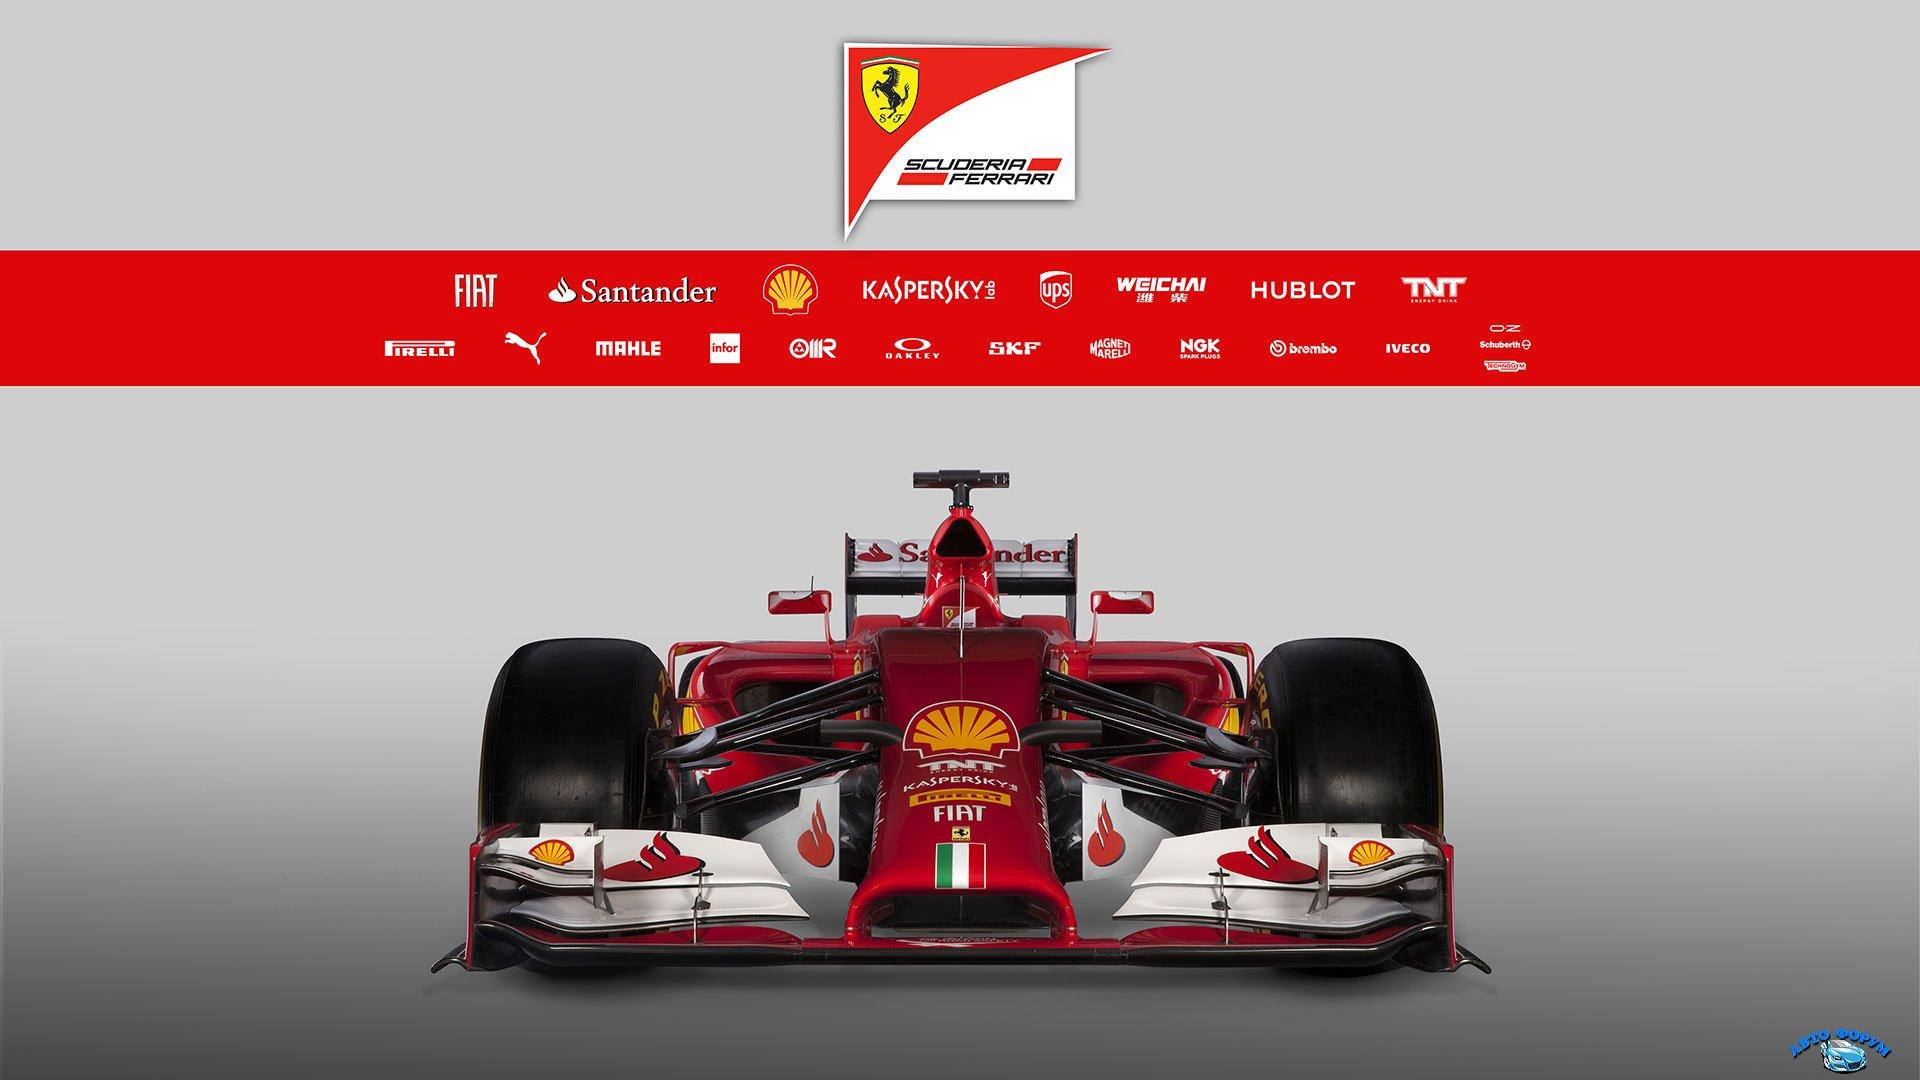 Ferrari-F14T-front-view-F1-Fansite.jpg